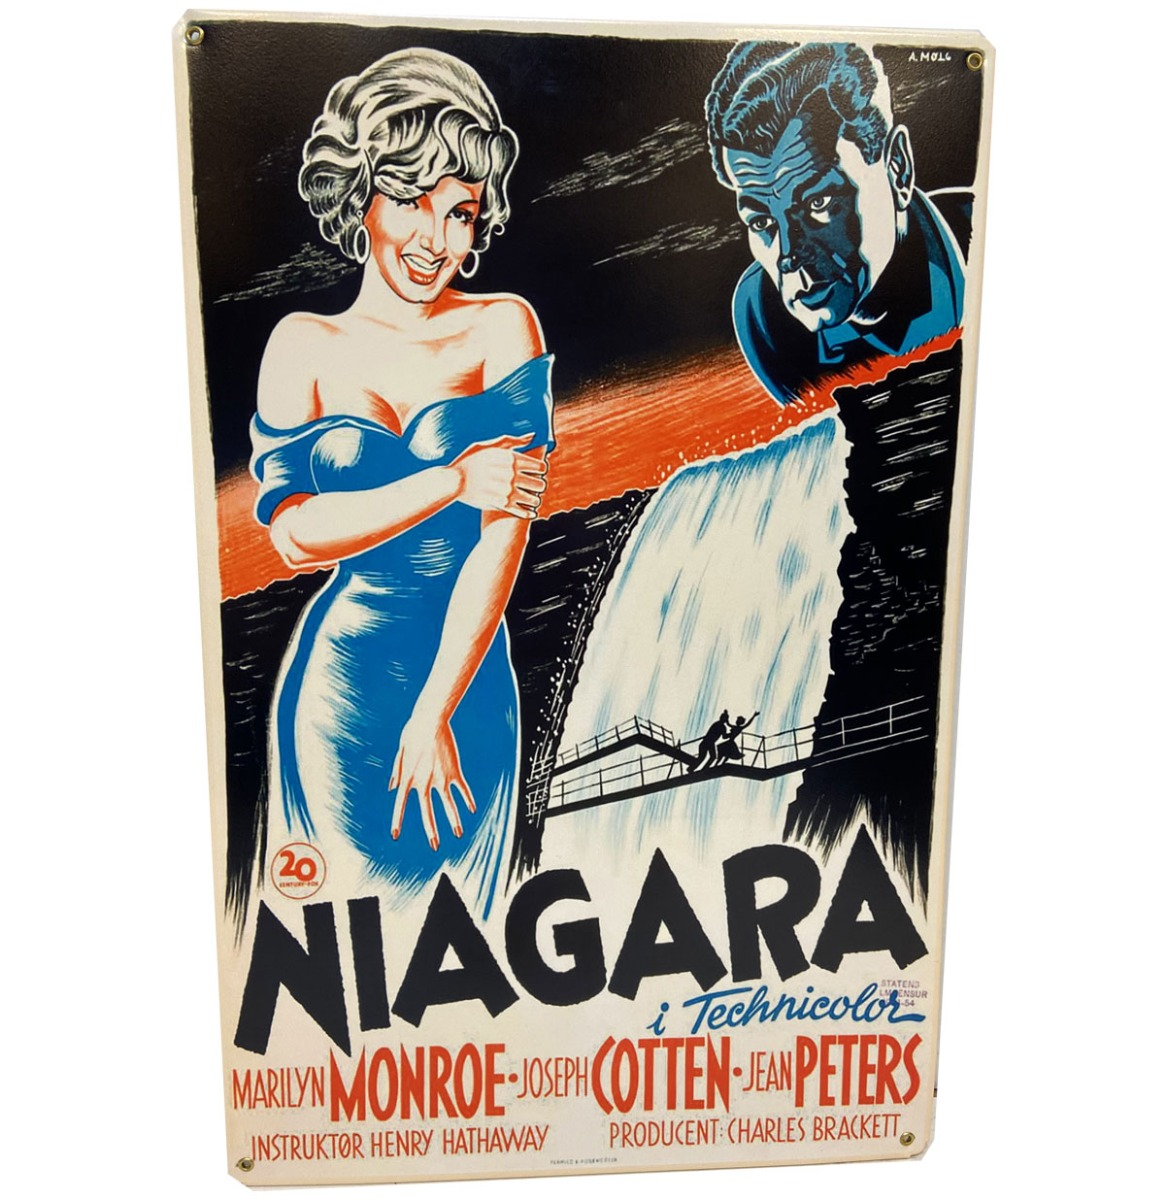 Marilyn Monroe Niagara Movie Poster Metalen Bord 29.5 x 44.5 cm